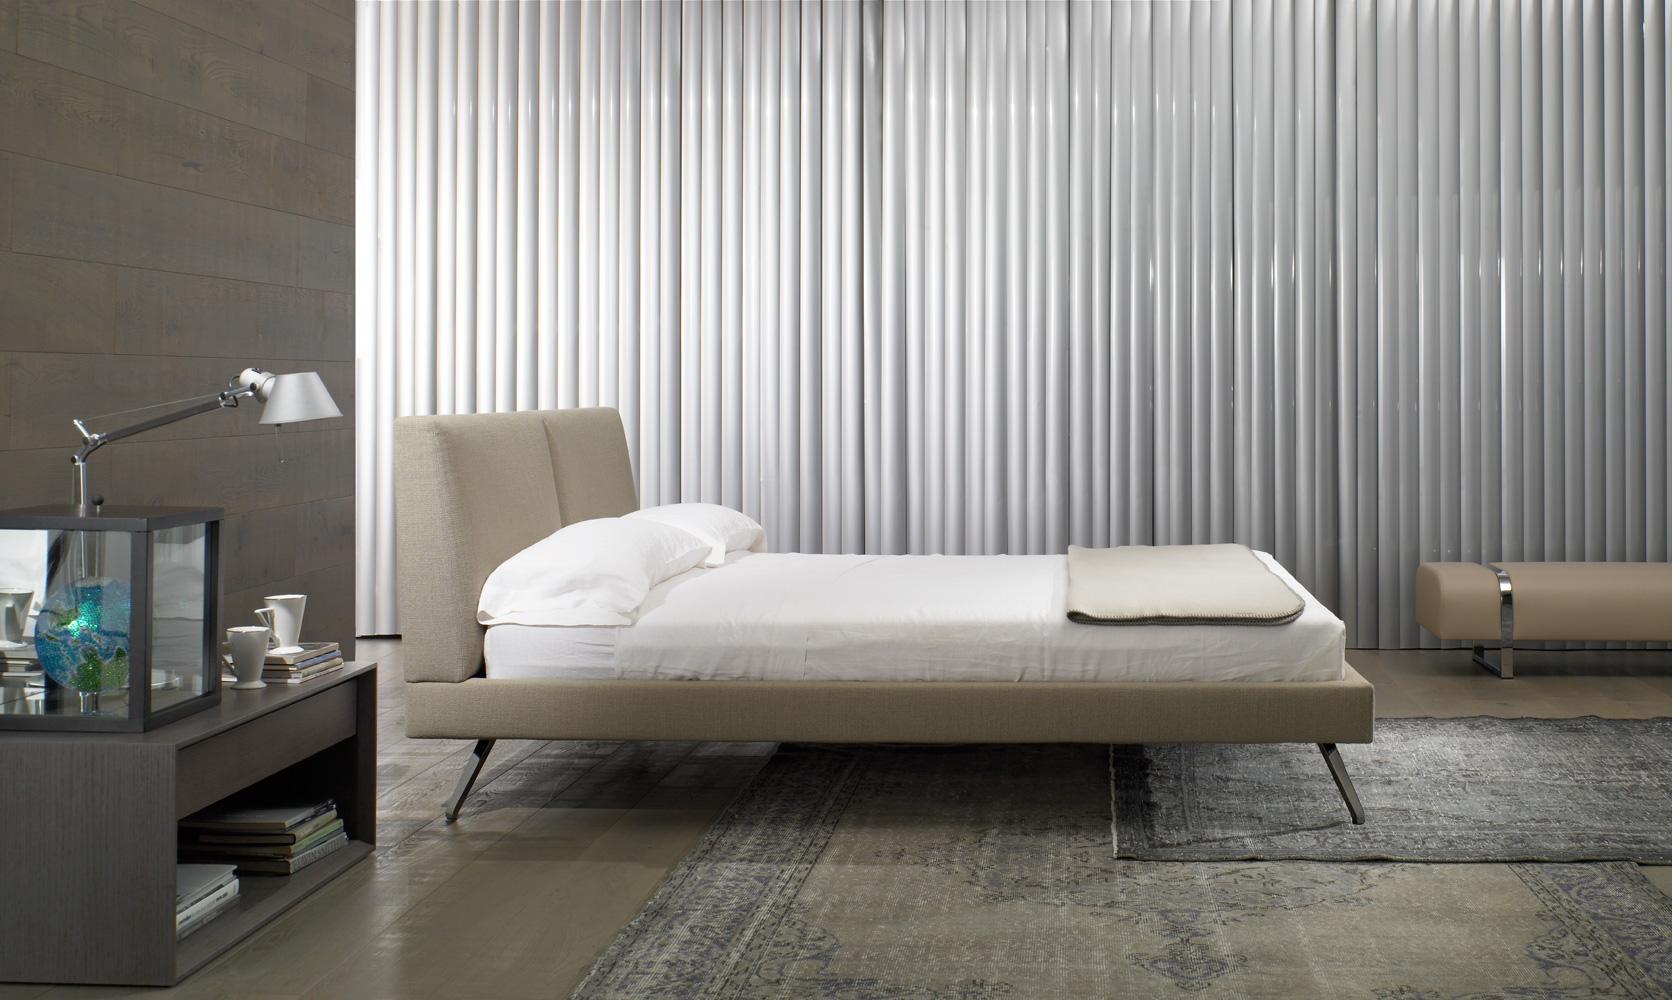 Modernūs miegamojo baldai Shelby 2